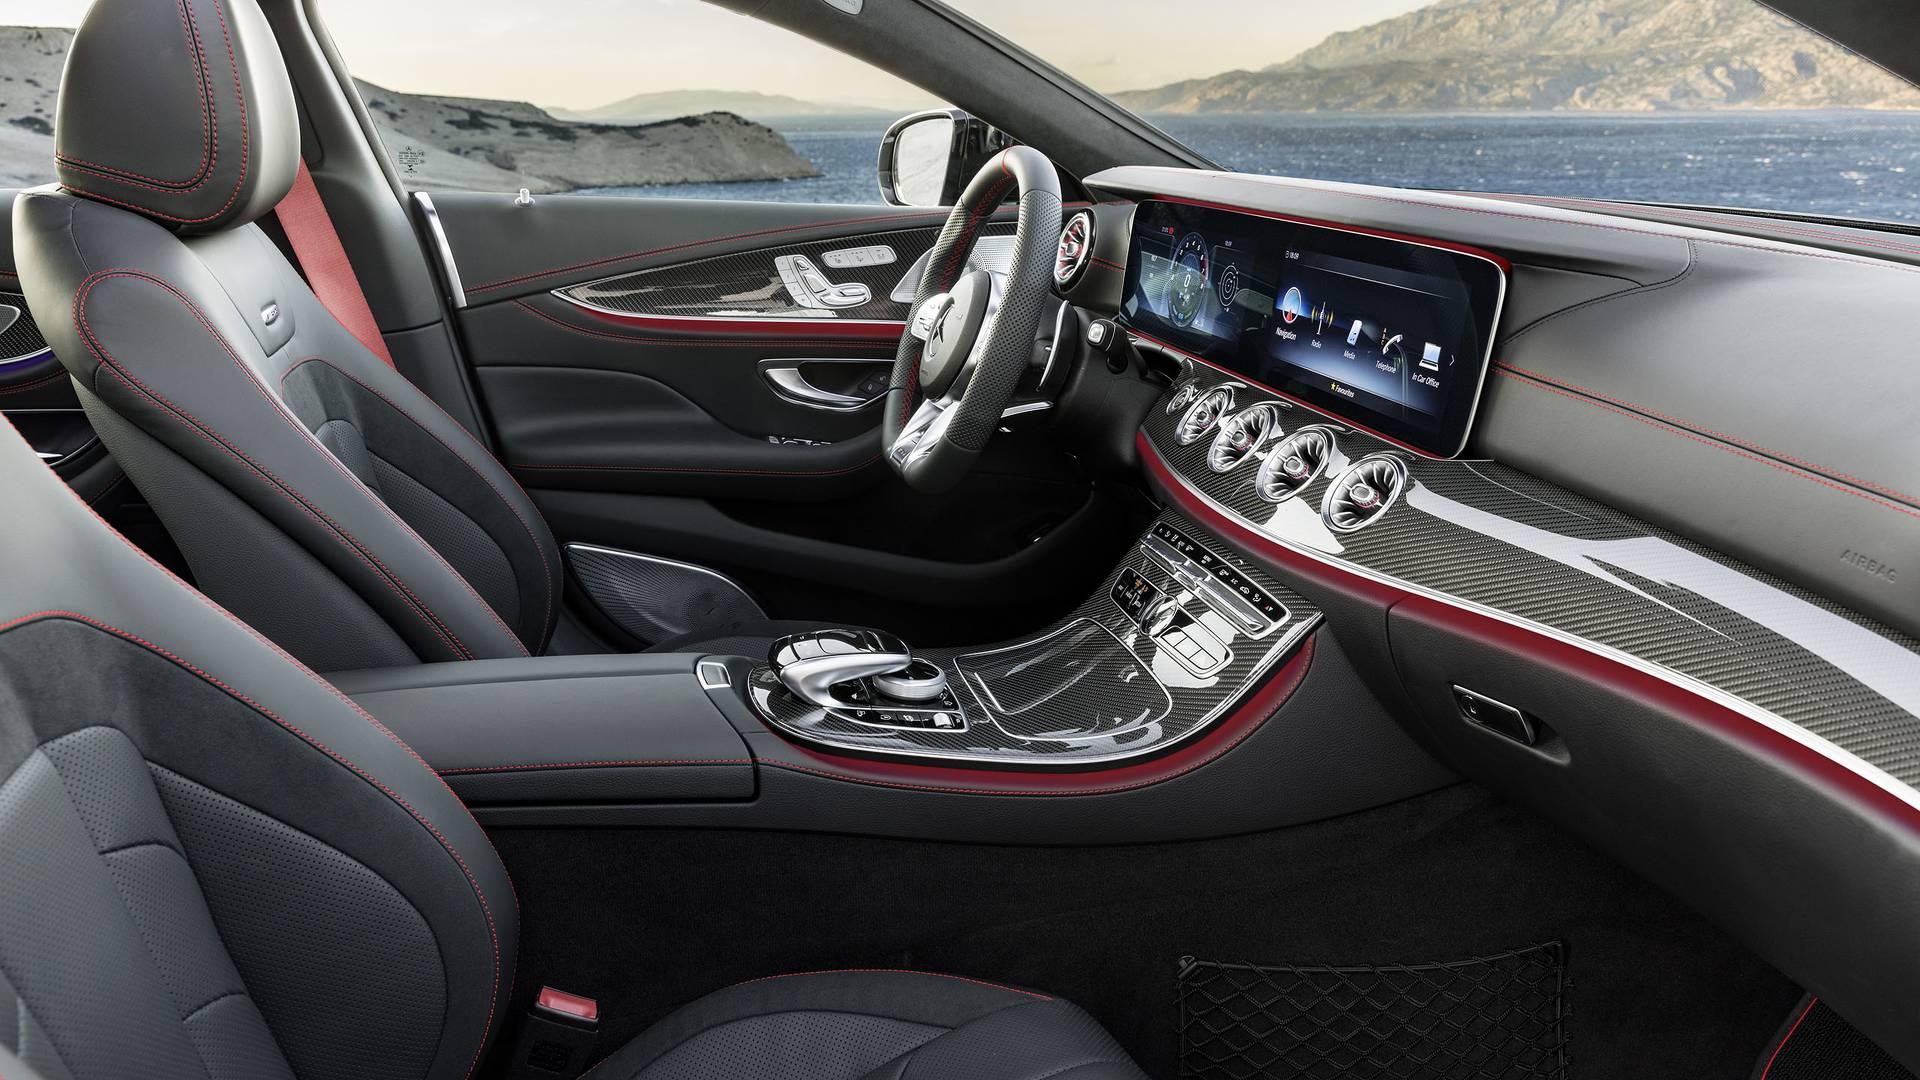 2018 Mercedes-AMG CLS53